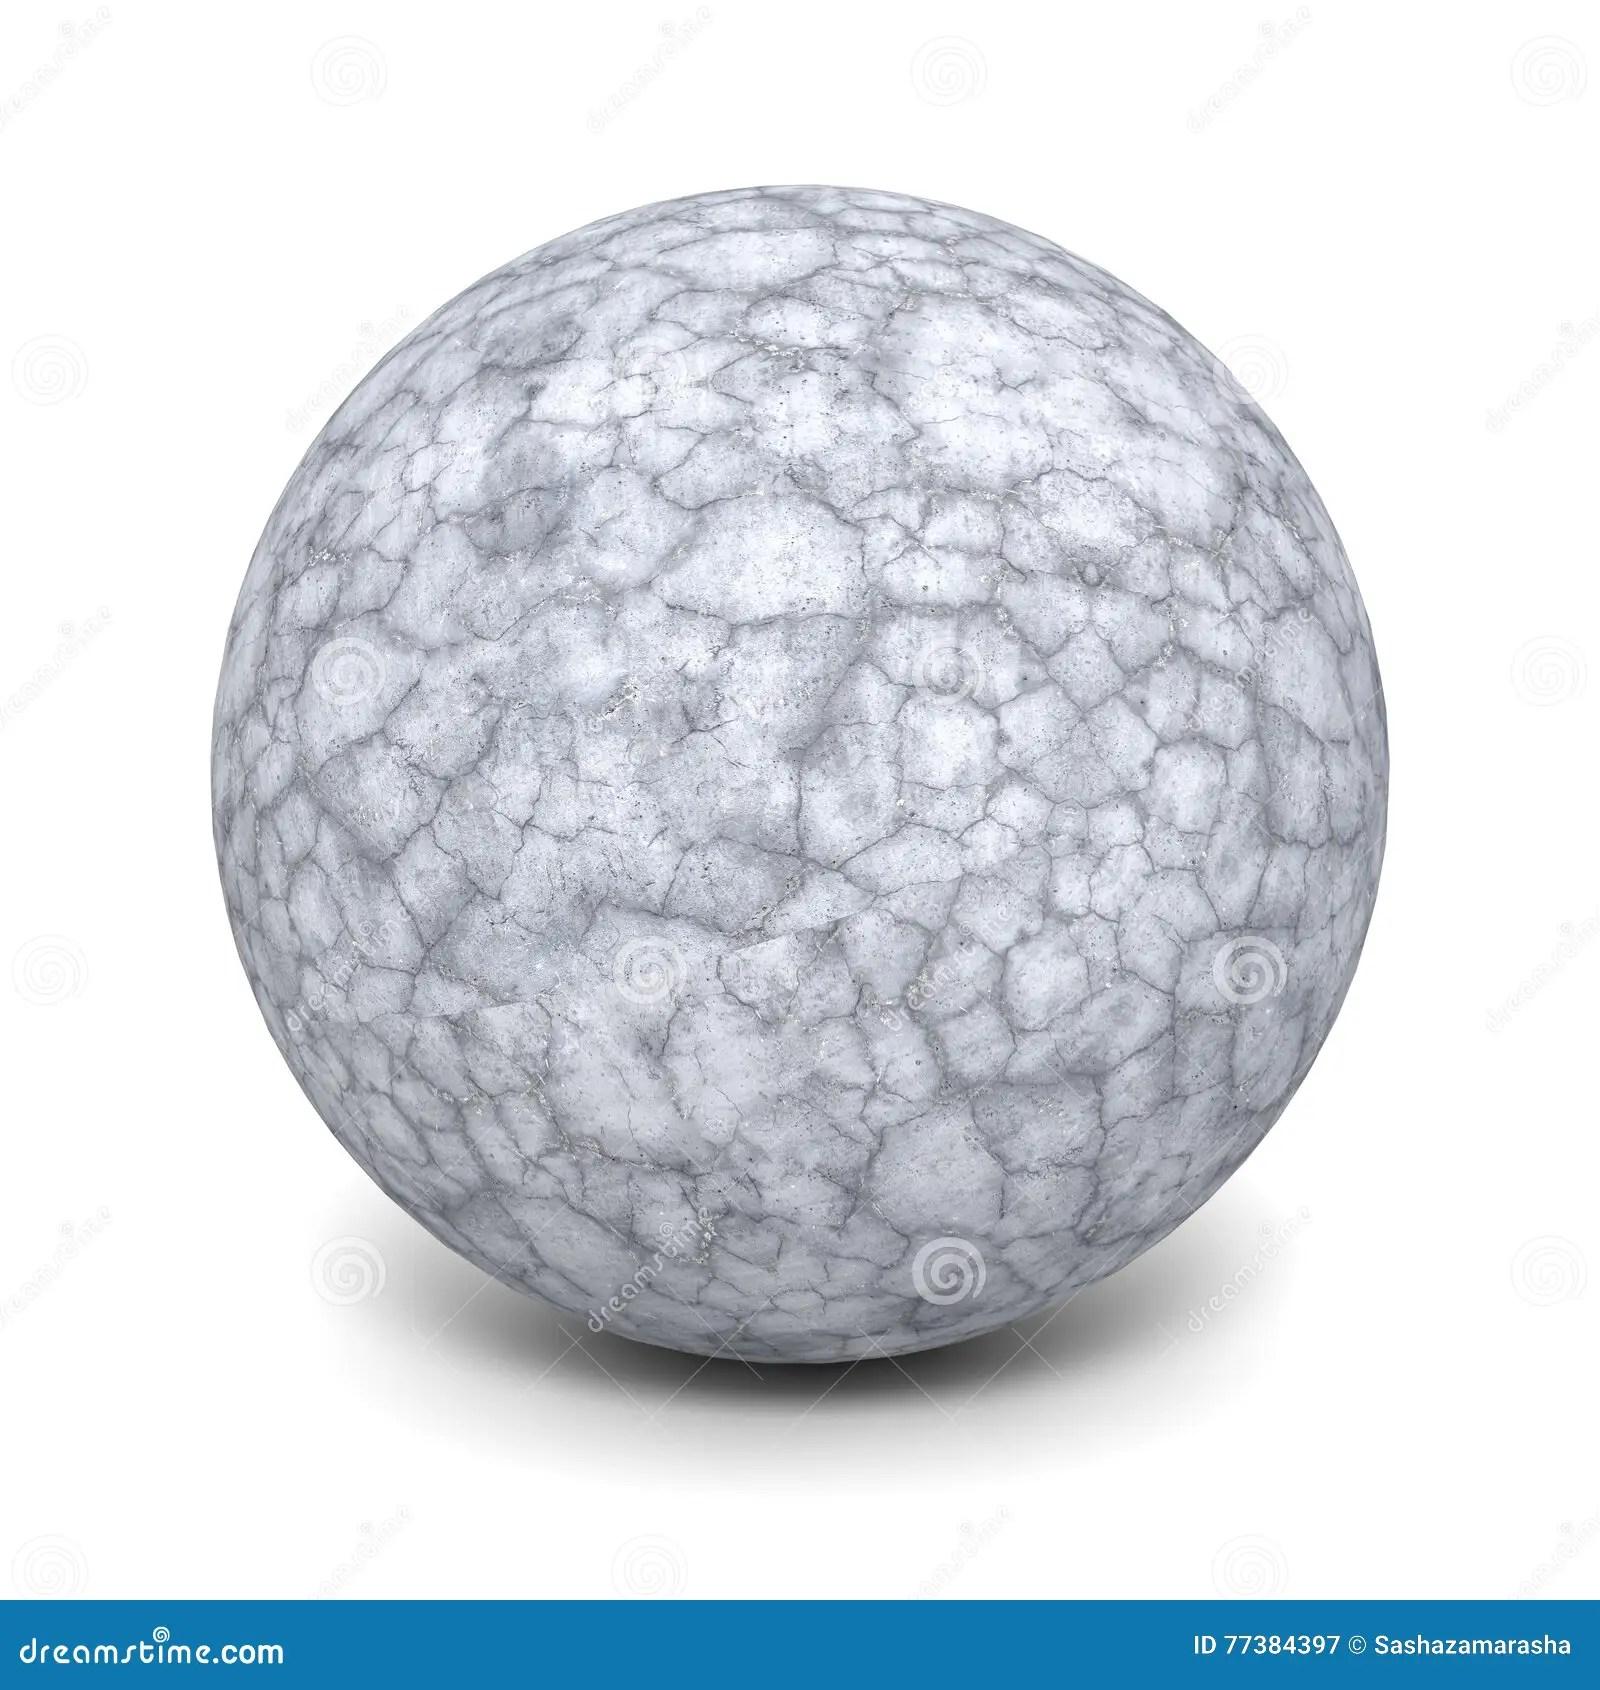 abstract concrete stone sphere